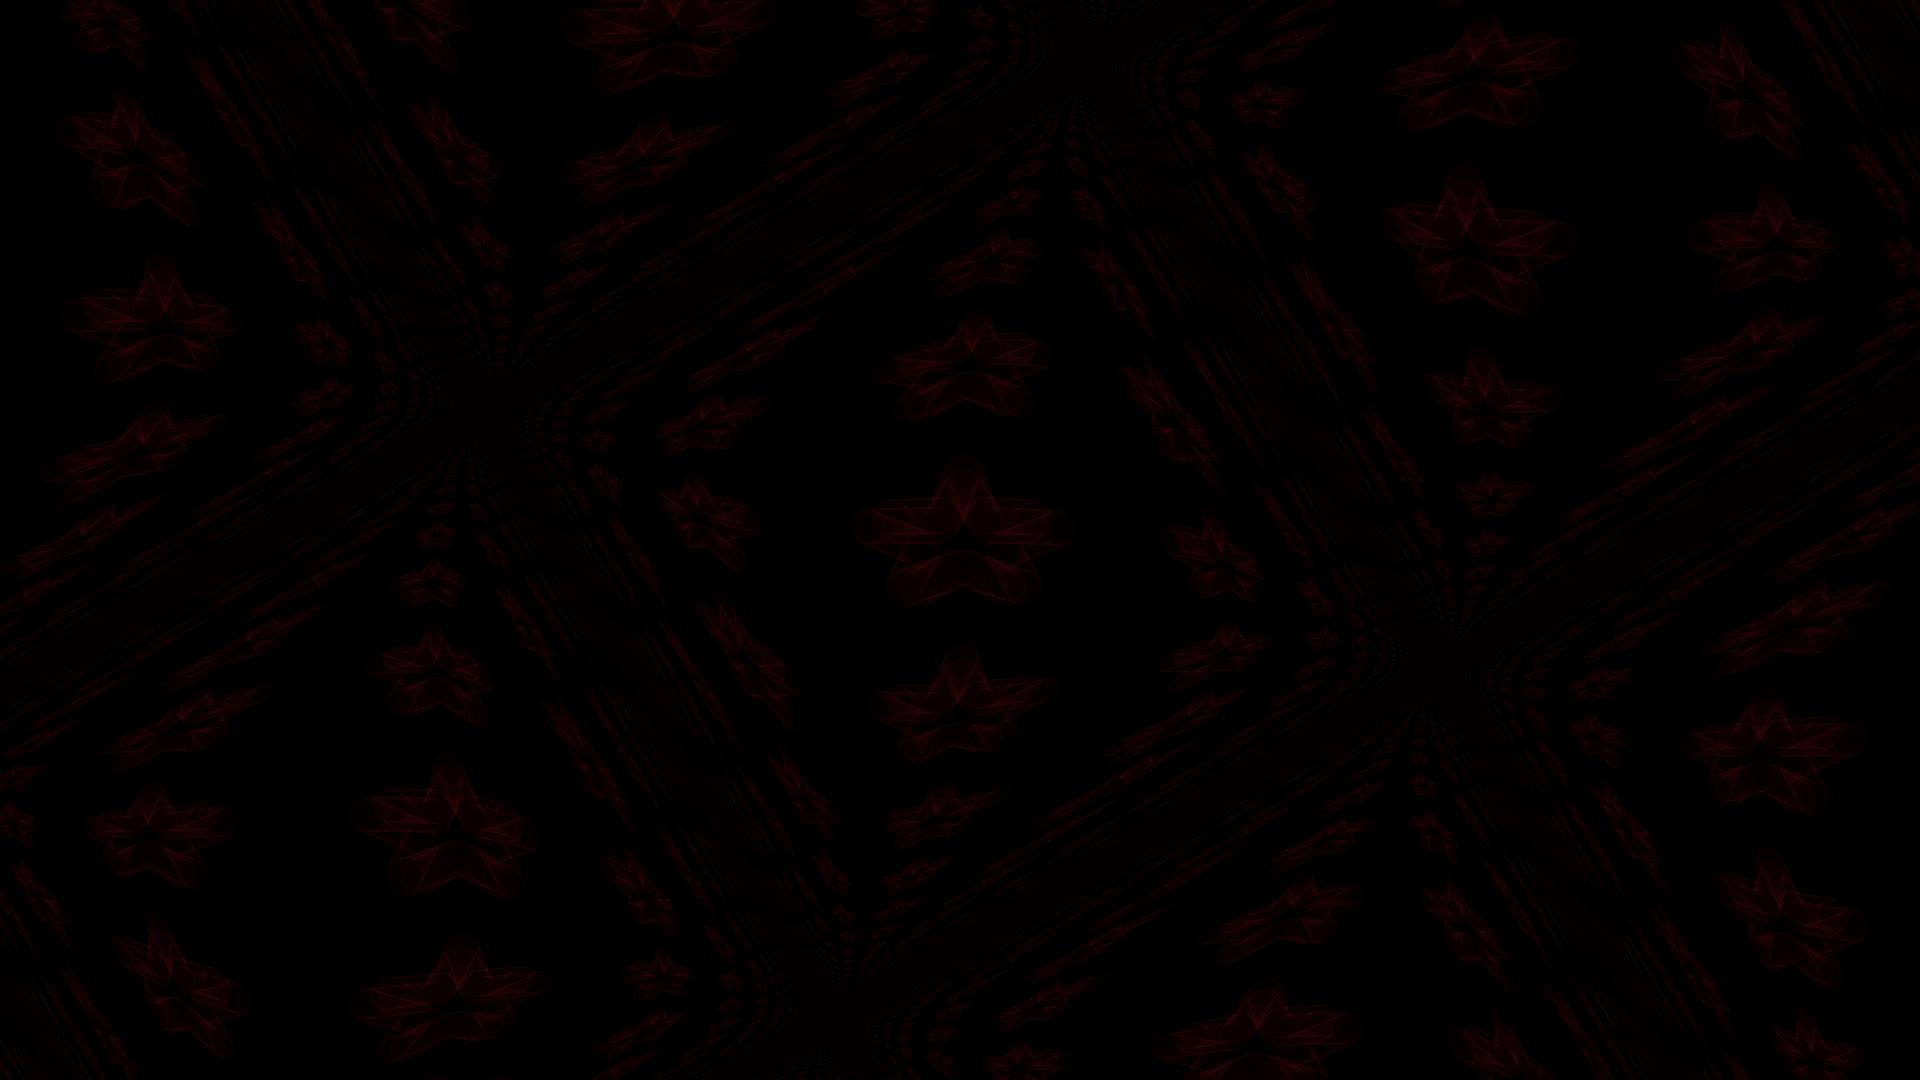 black wallpaper x - photo #16